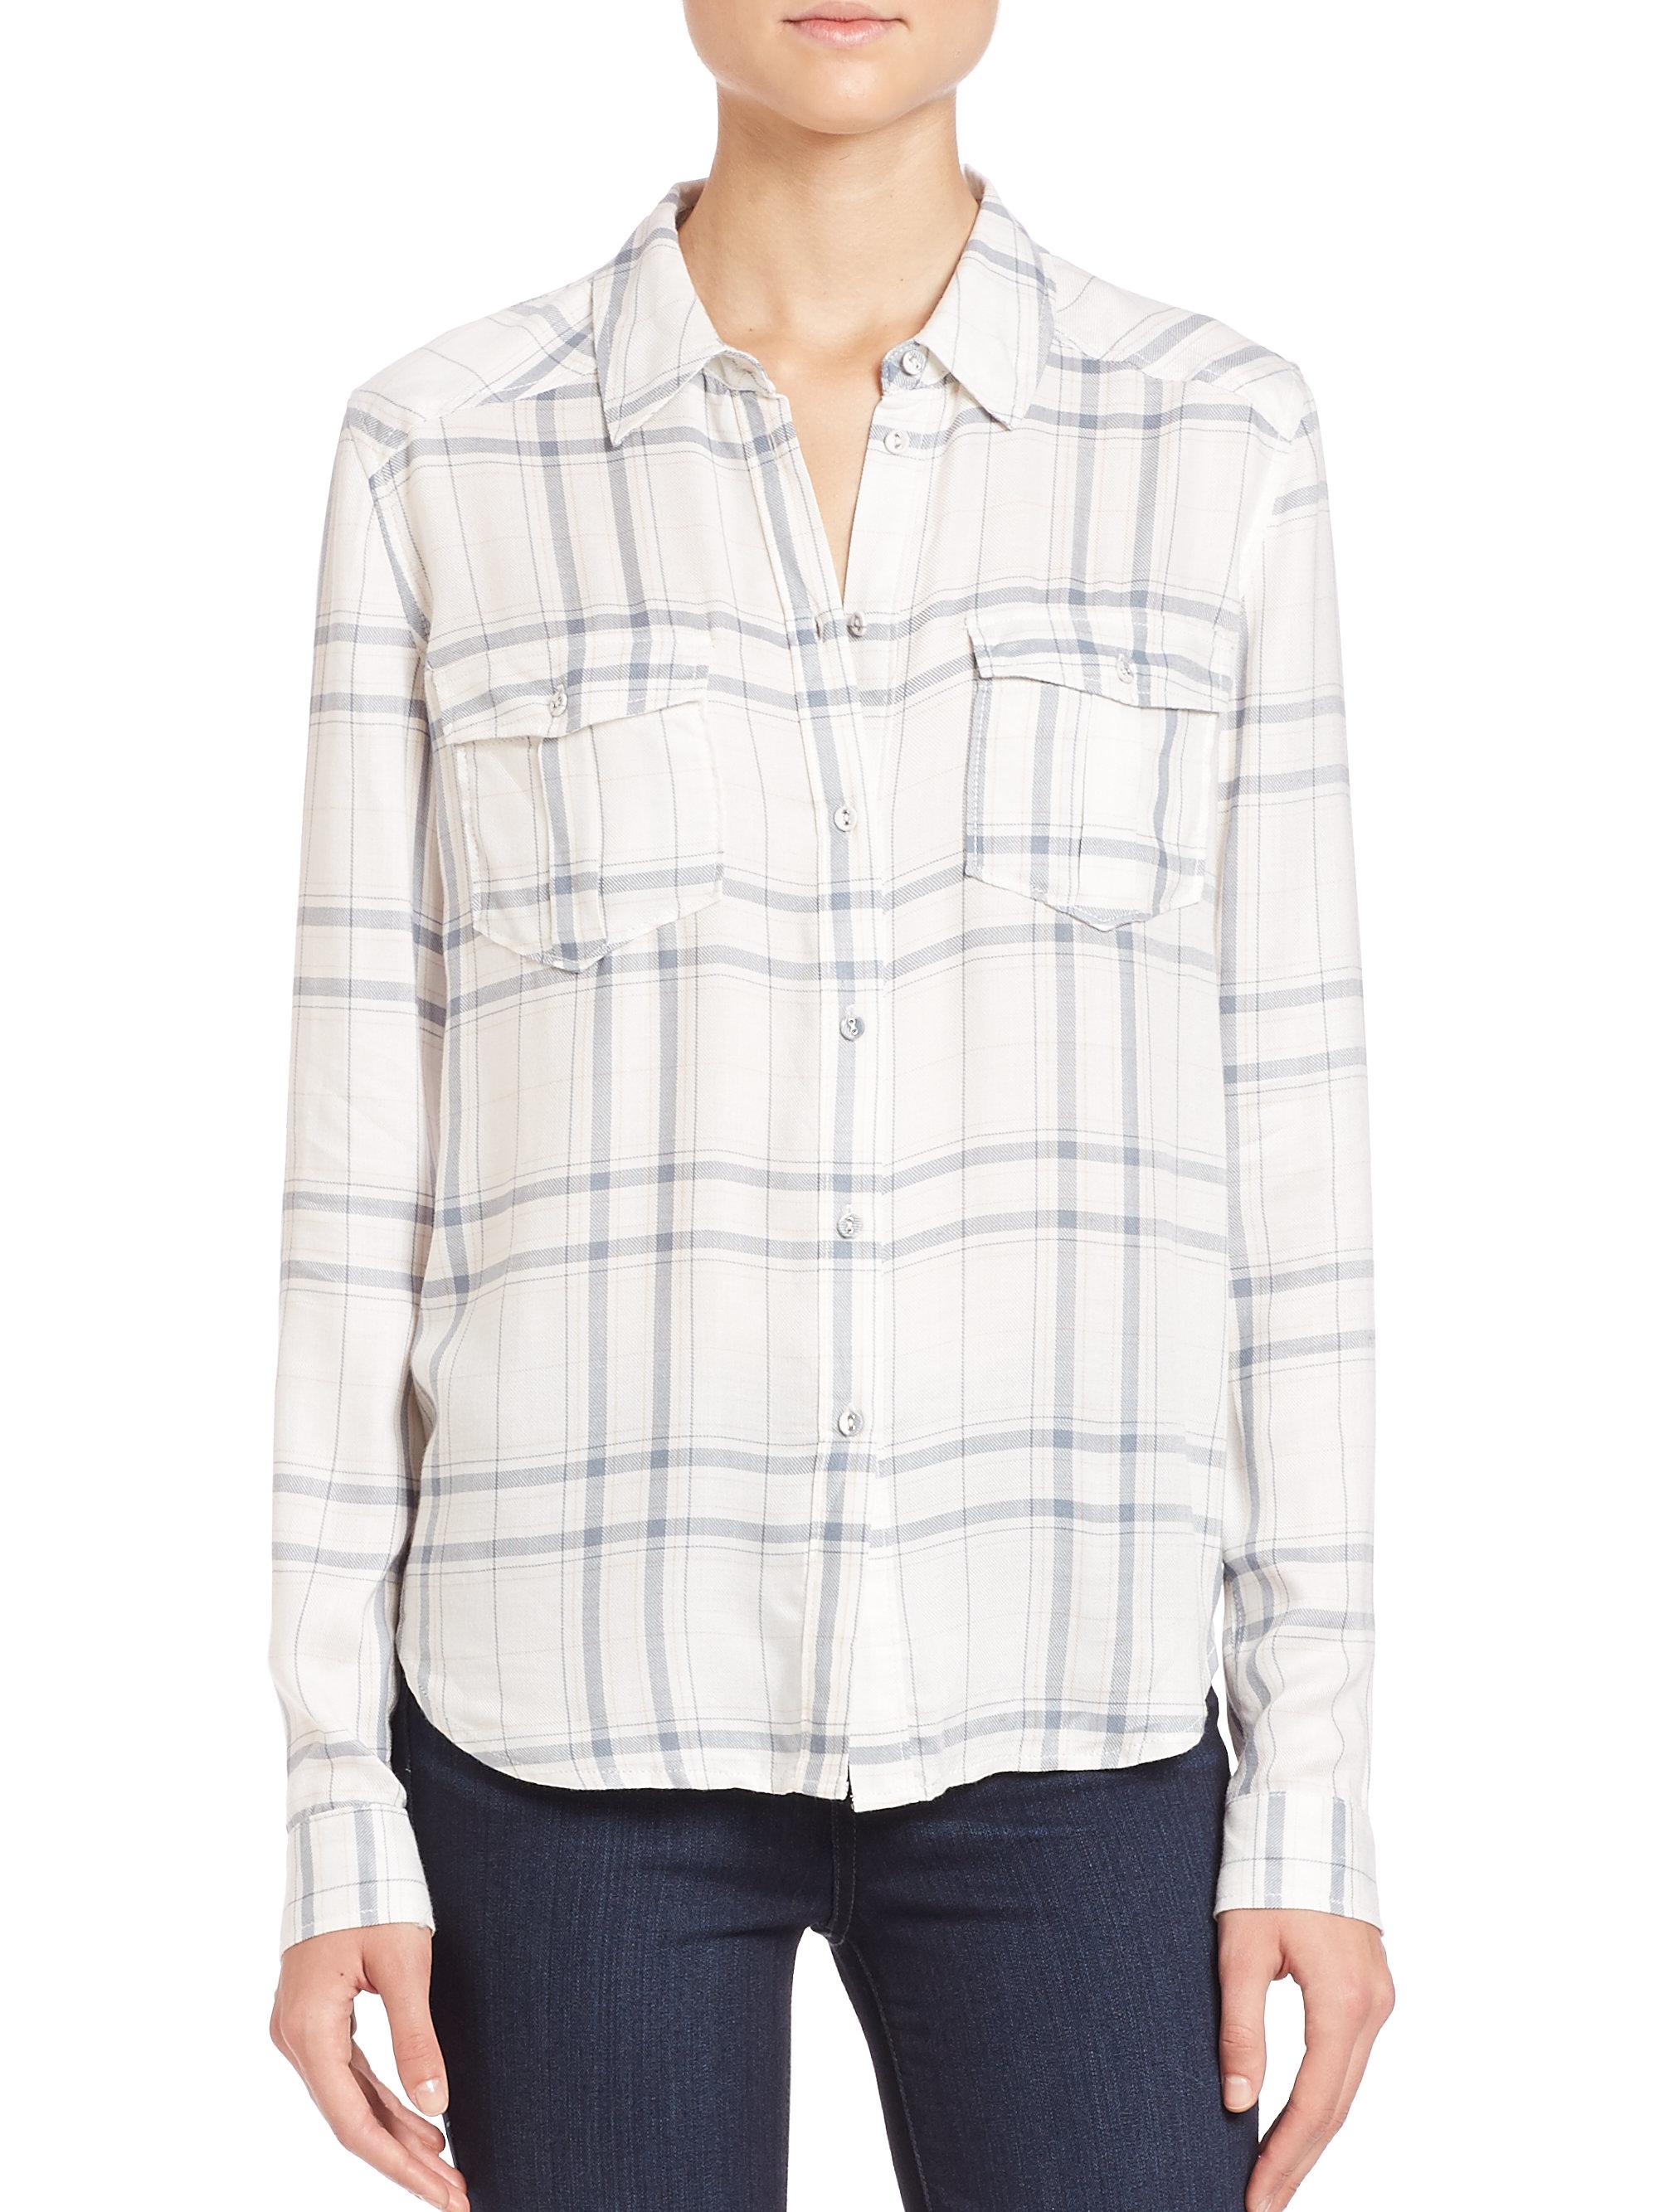 Paige mya plaid shirt in gray lyst for Grey plaid shirt womens